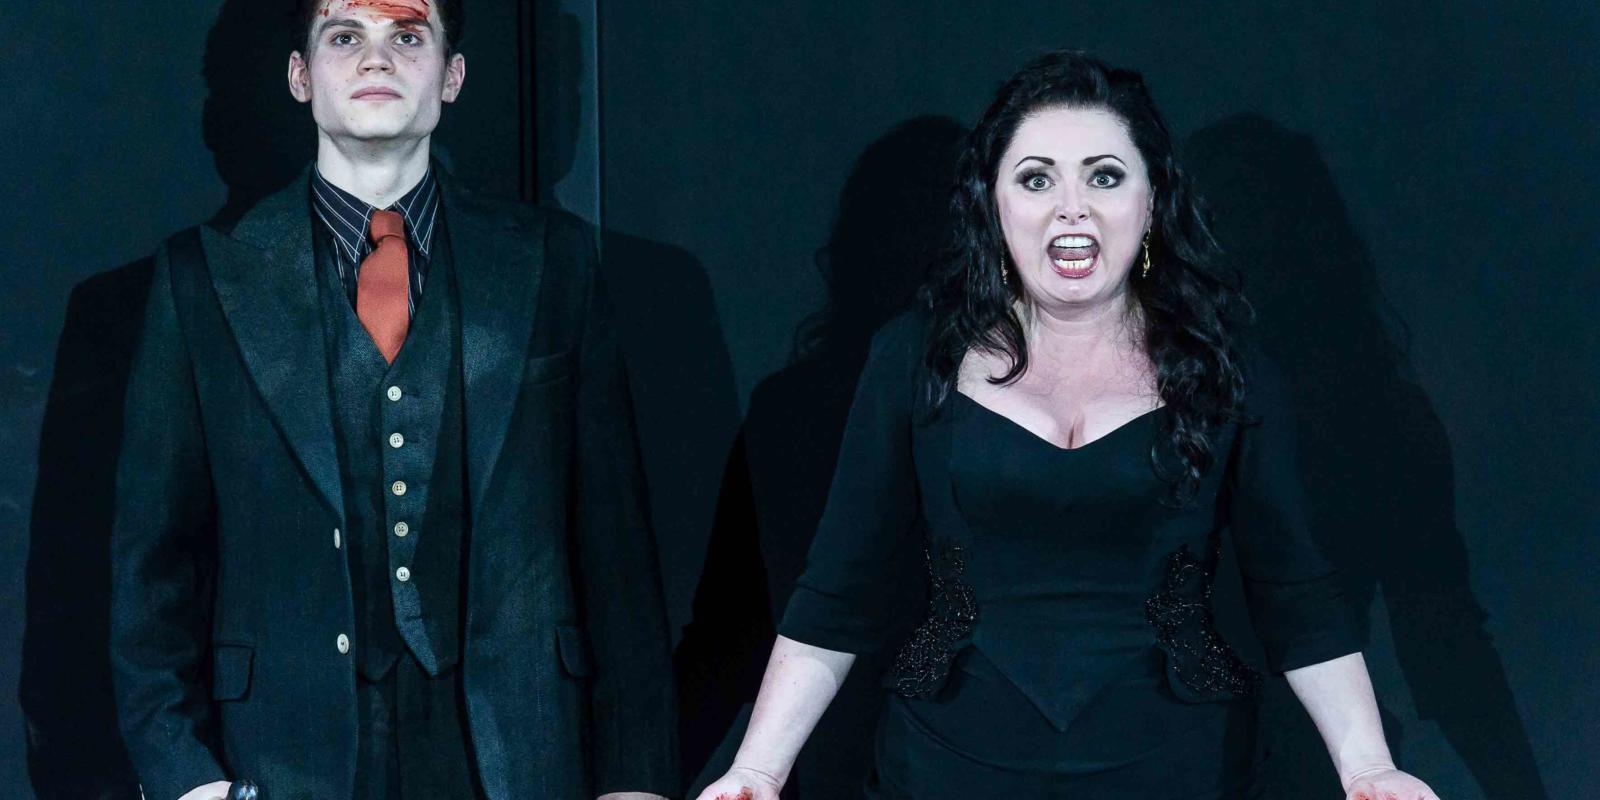 An image of Matt Casey and Rebecca Evans in Richard Jones's 2014 production of Rodelinda